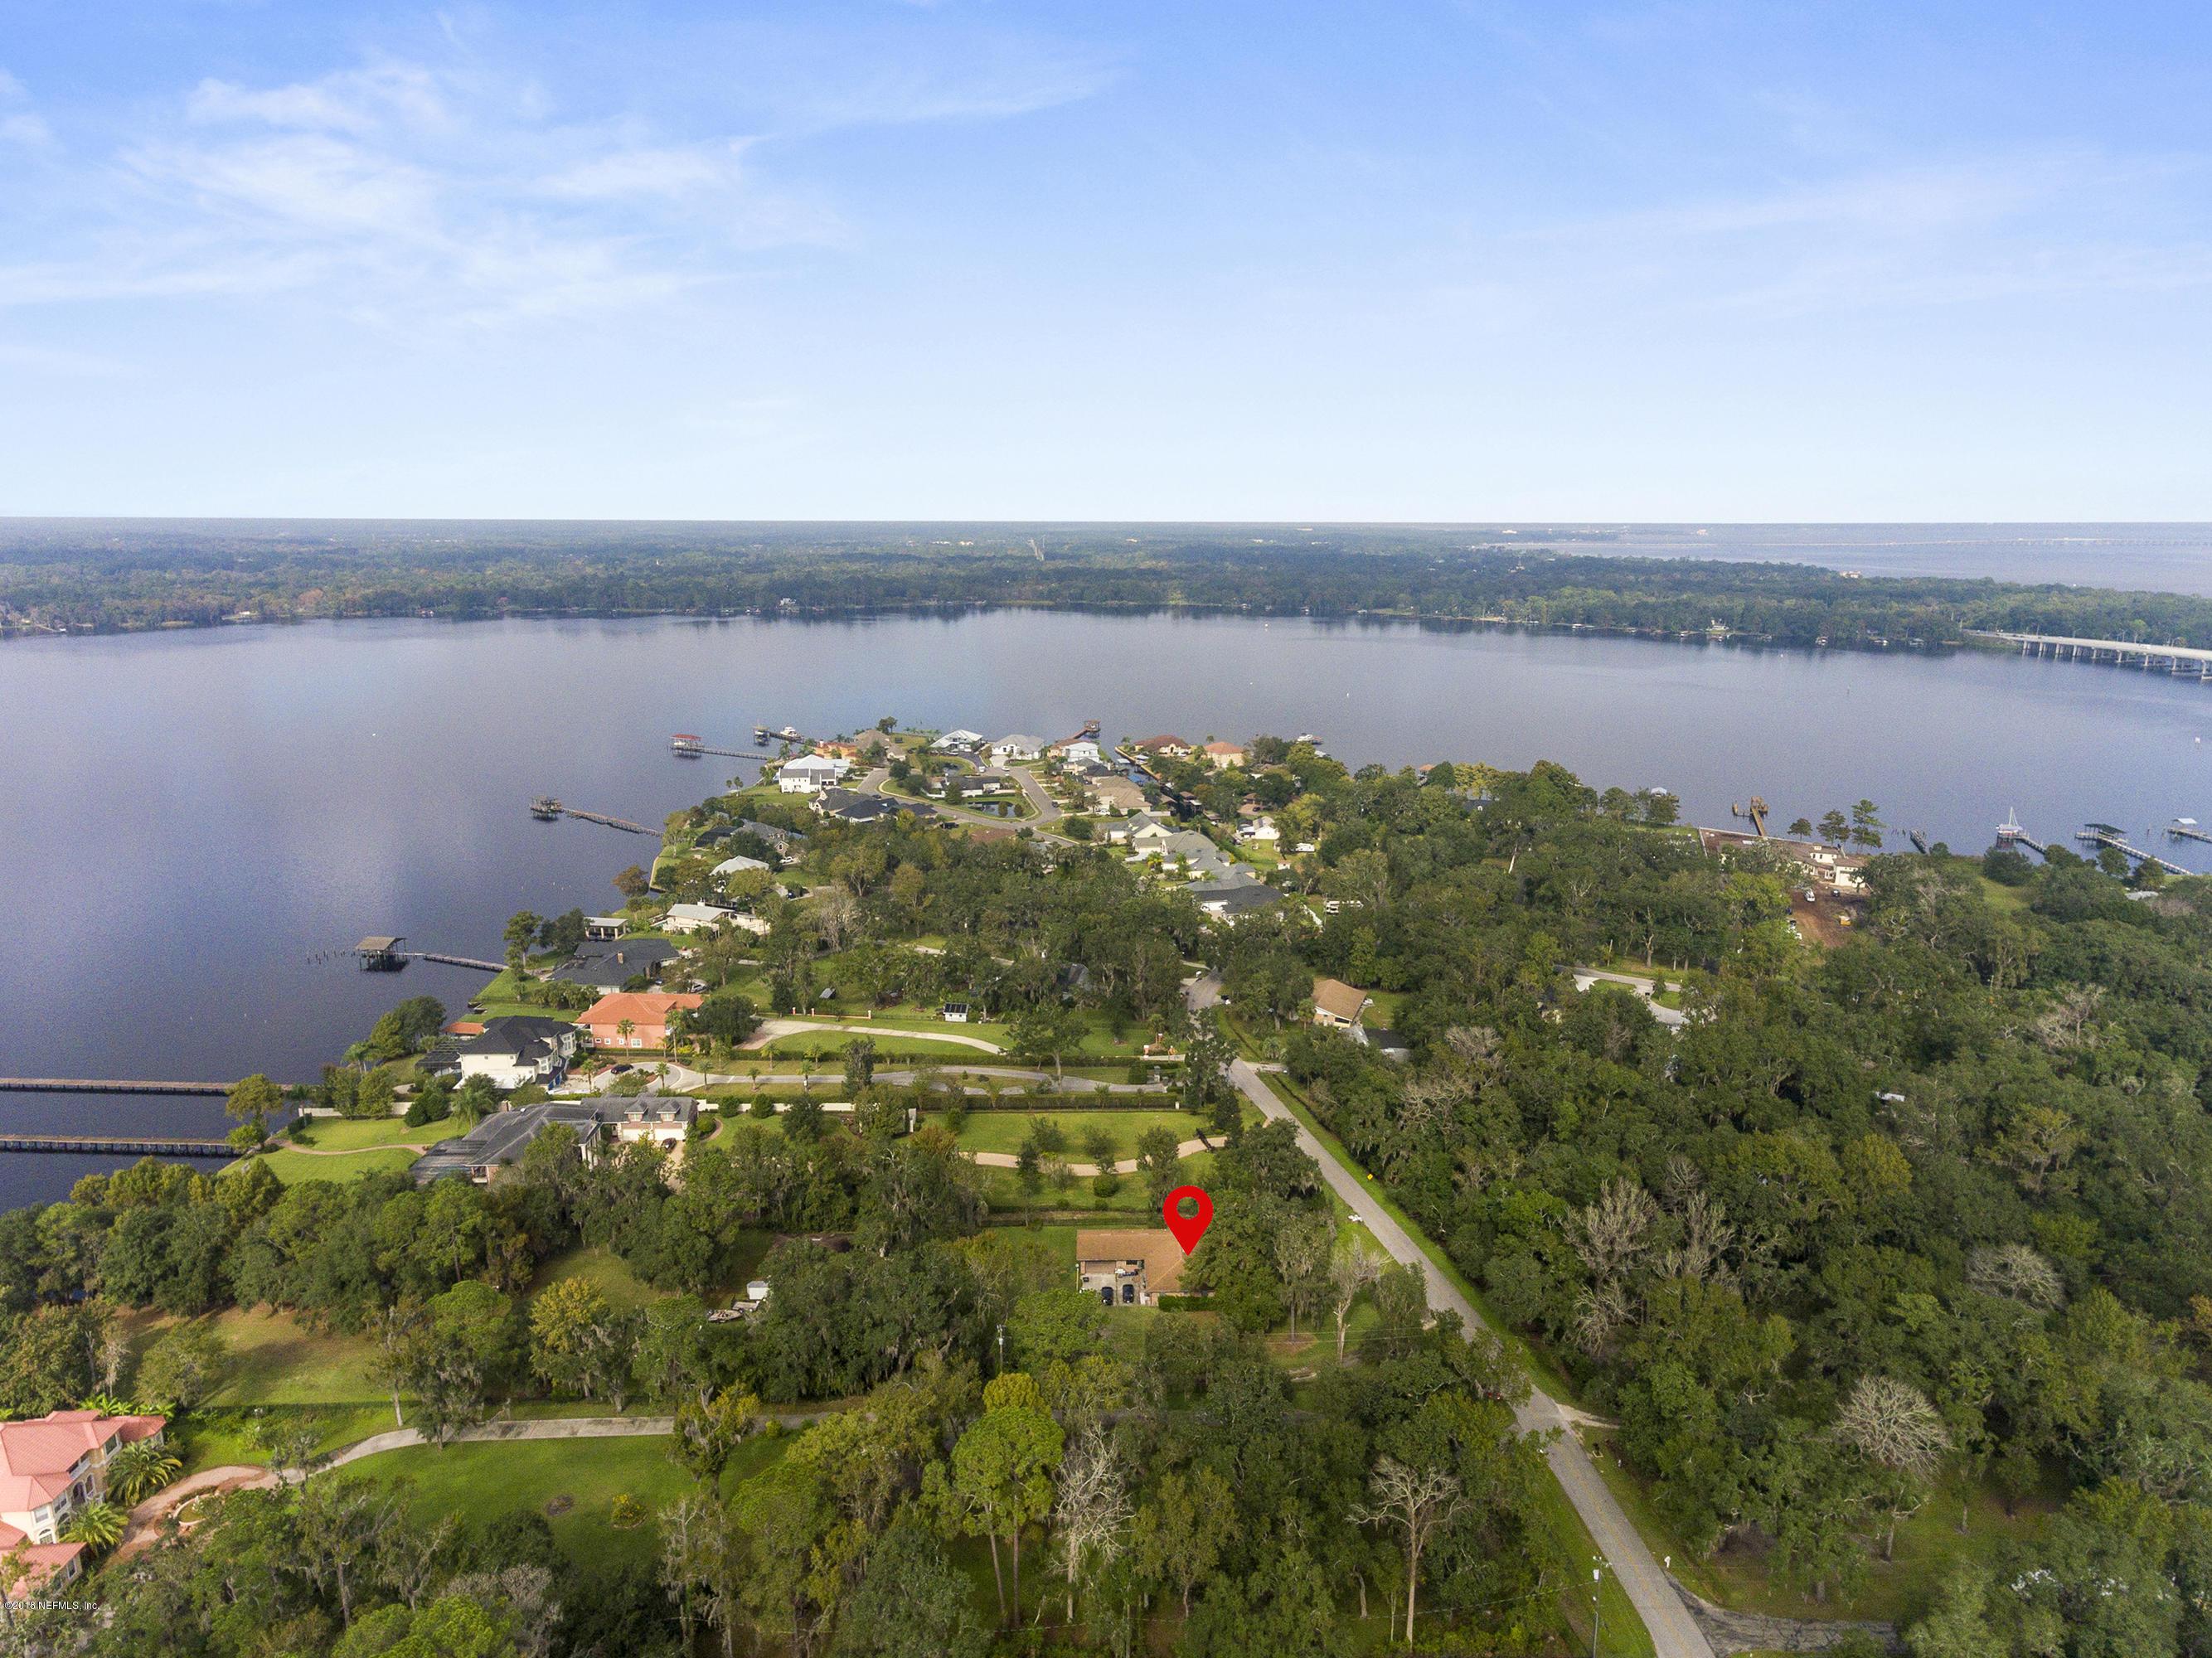 833 CREIGHTON, FLEMING ISLAND, FLORIDA 32003-7010, 3 Bedrooms Bedrooms, ,3 BathroomsBathrooms,Residential - single family,For sale,CREIGHTON,968845